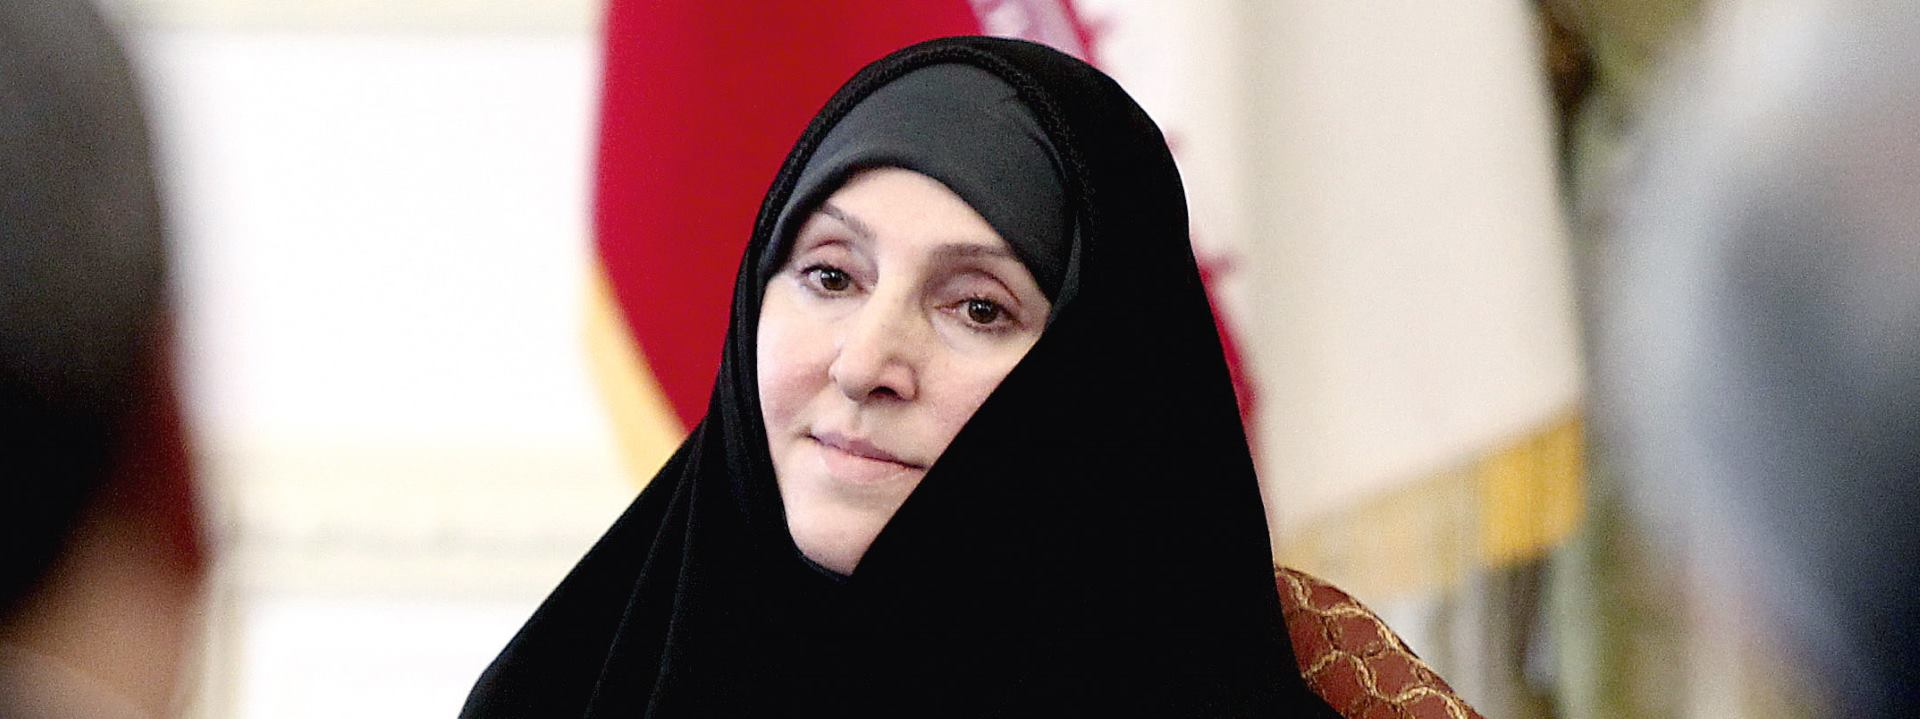 VELIKI USPJEH NAJMOĆNIJE ŽENE IRANSKE POLITIKE